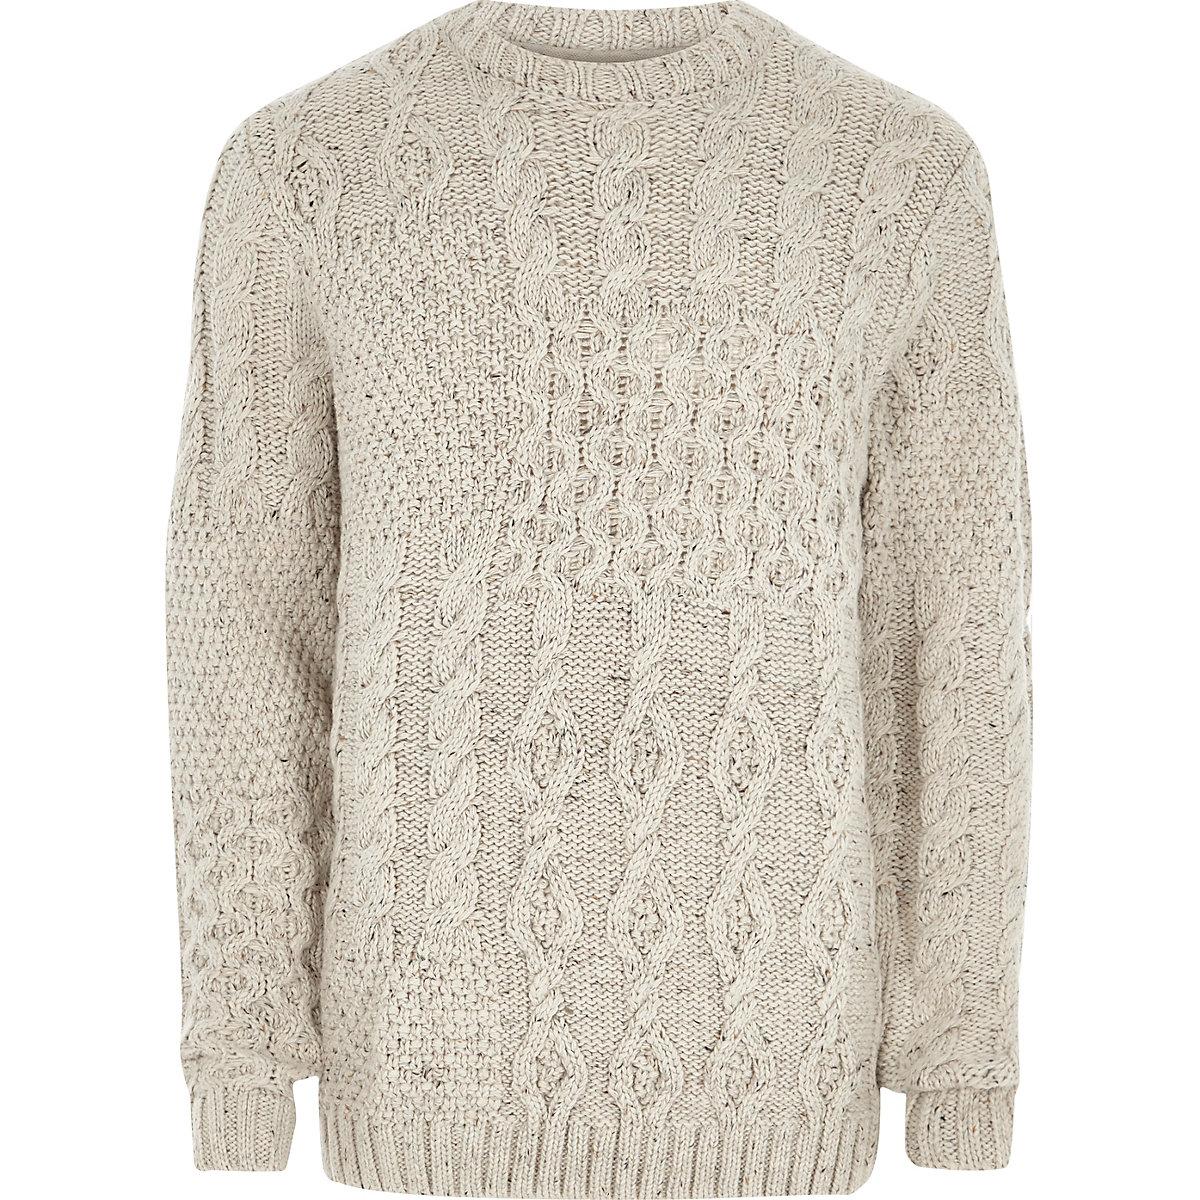 Cream spliced cable knit jumper